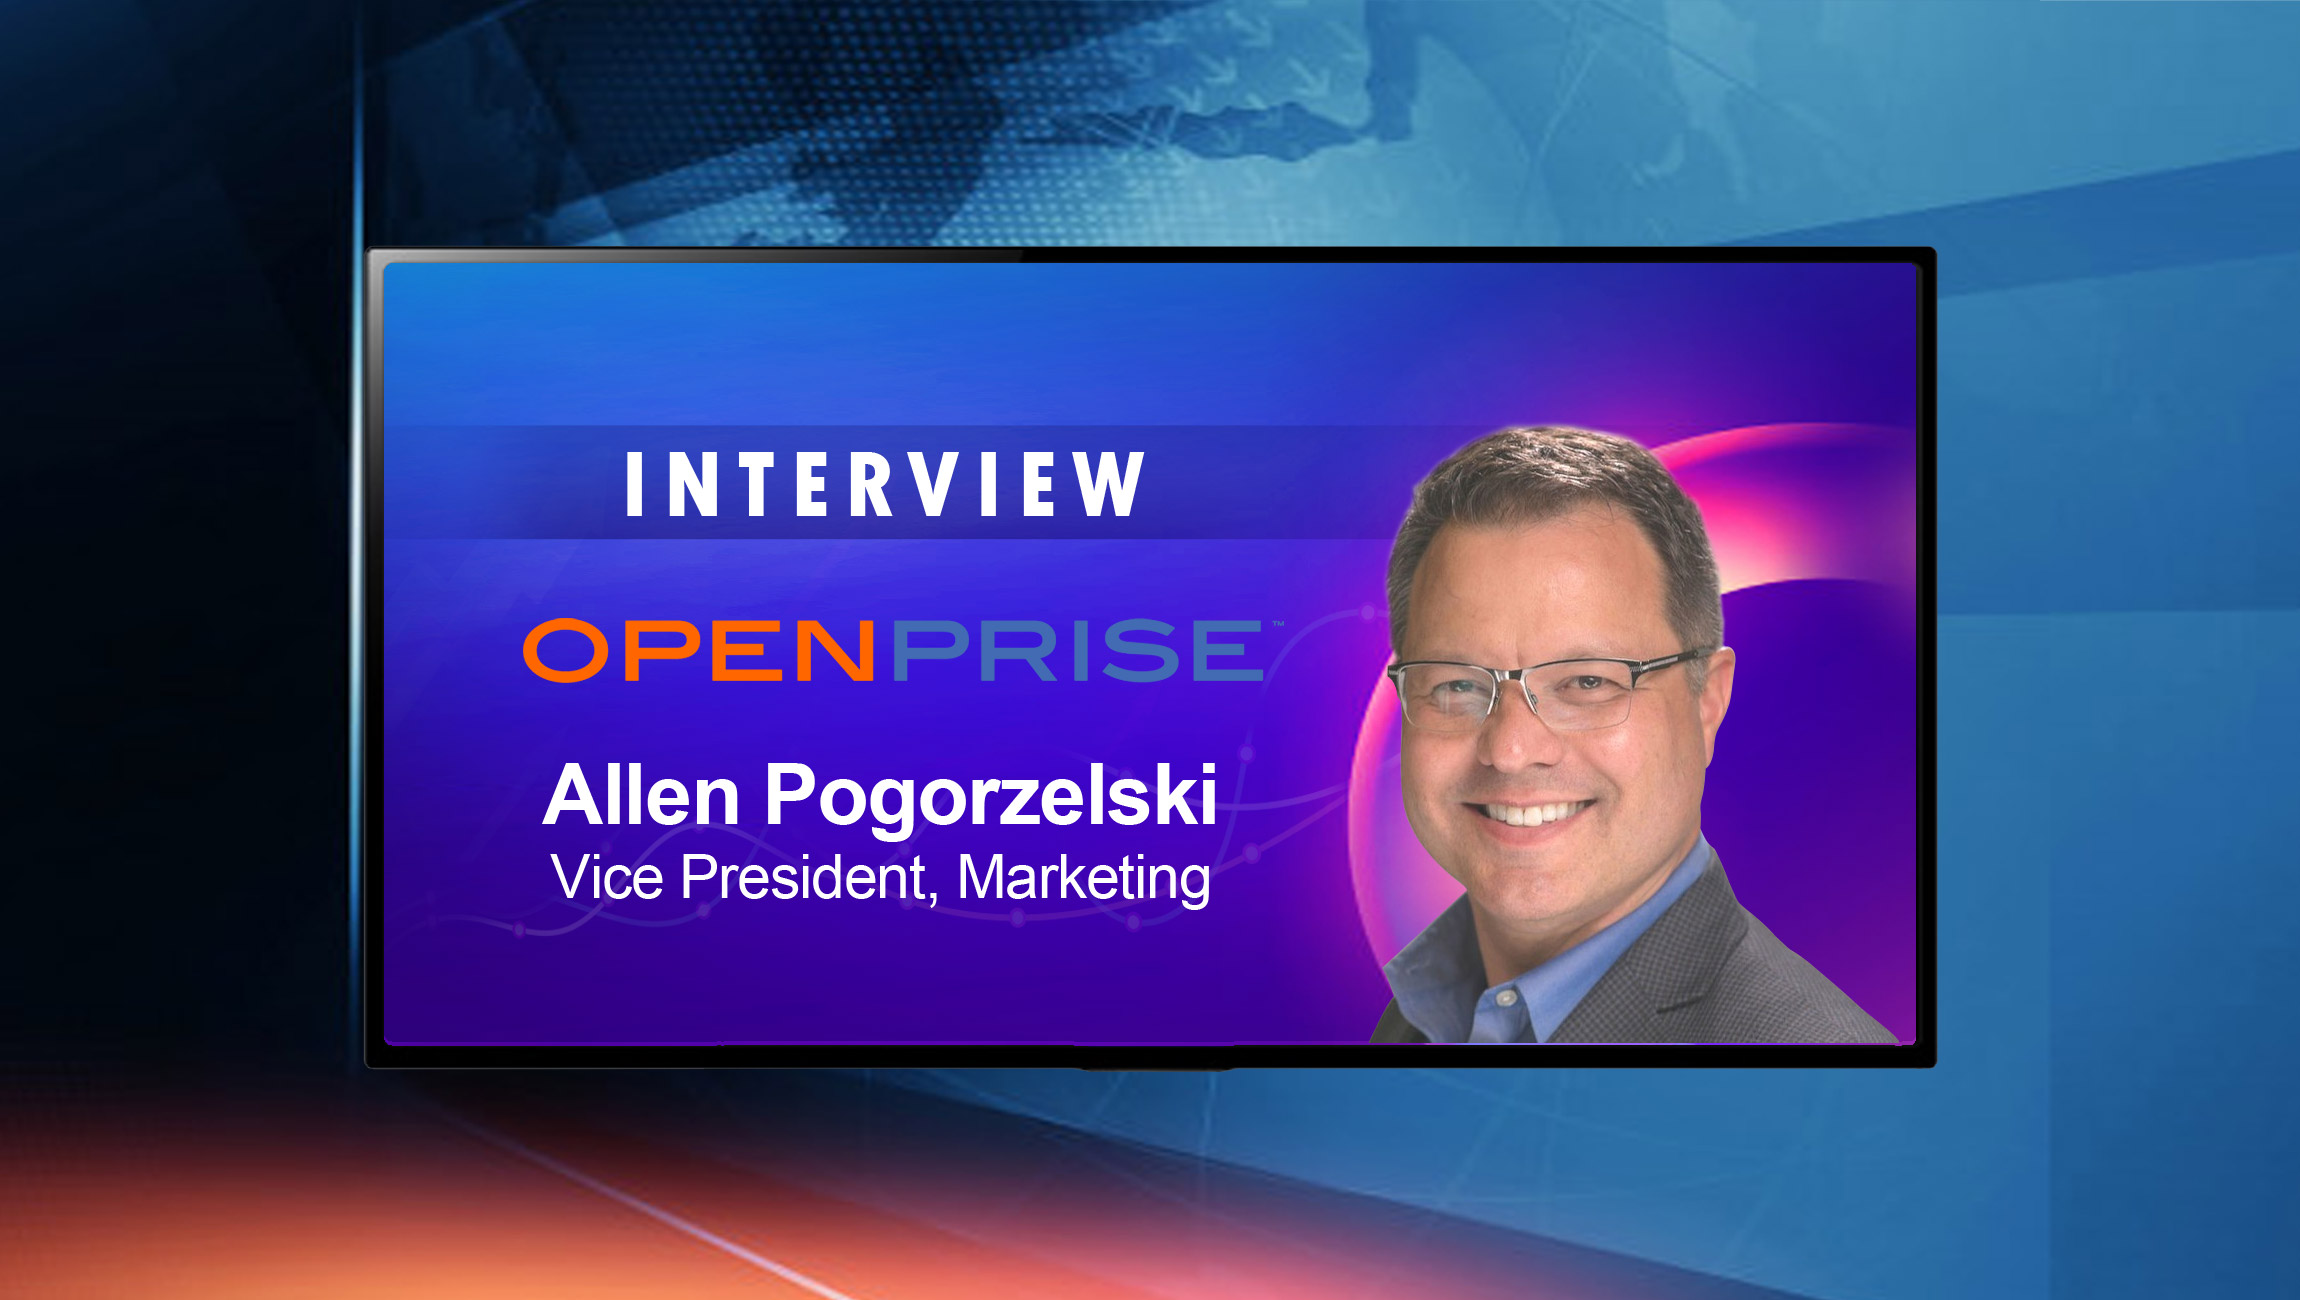 SalesTechStar Interview with Allen Pogorzelski, Vice President, Marketing at Openprise